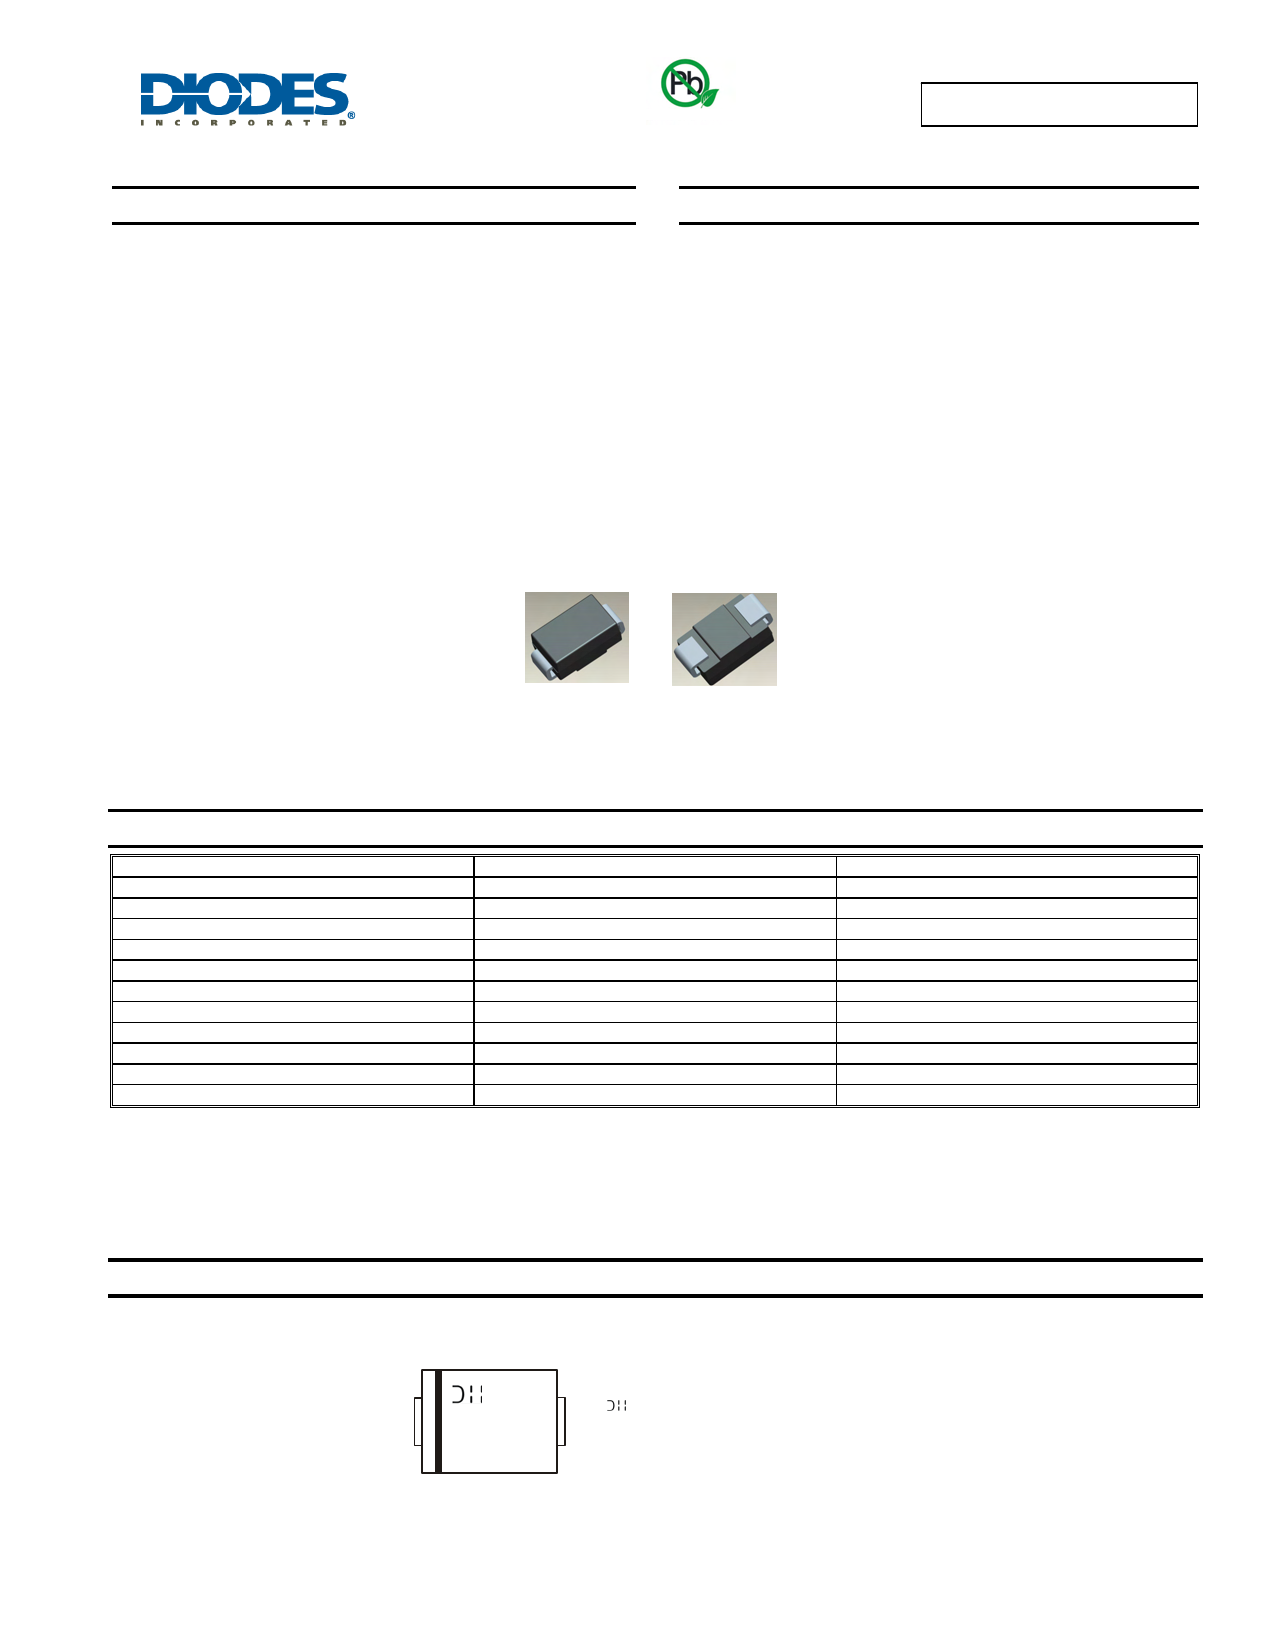 TB3500M datasheet